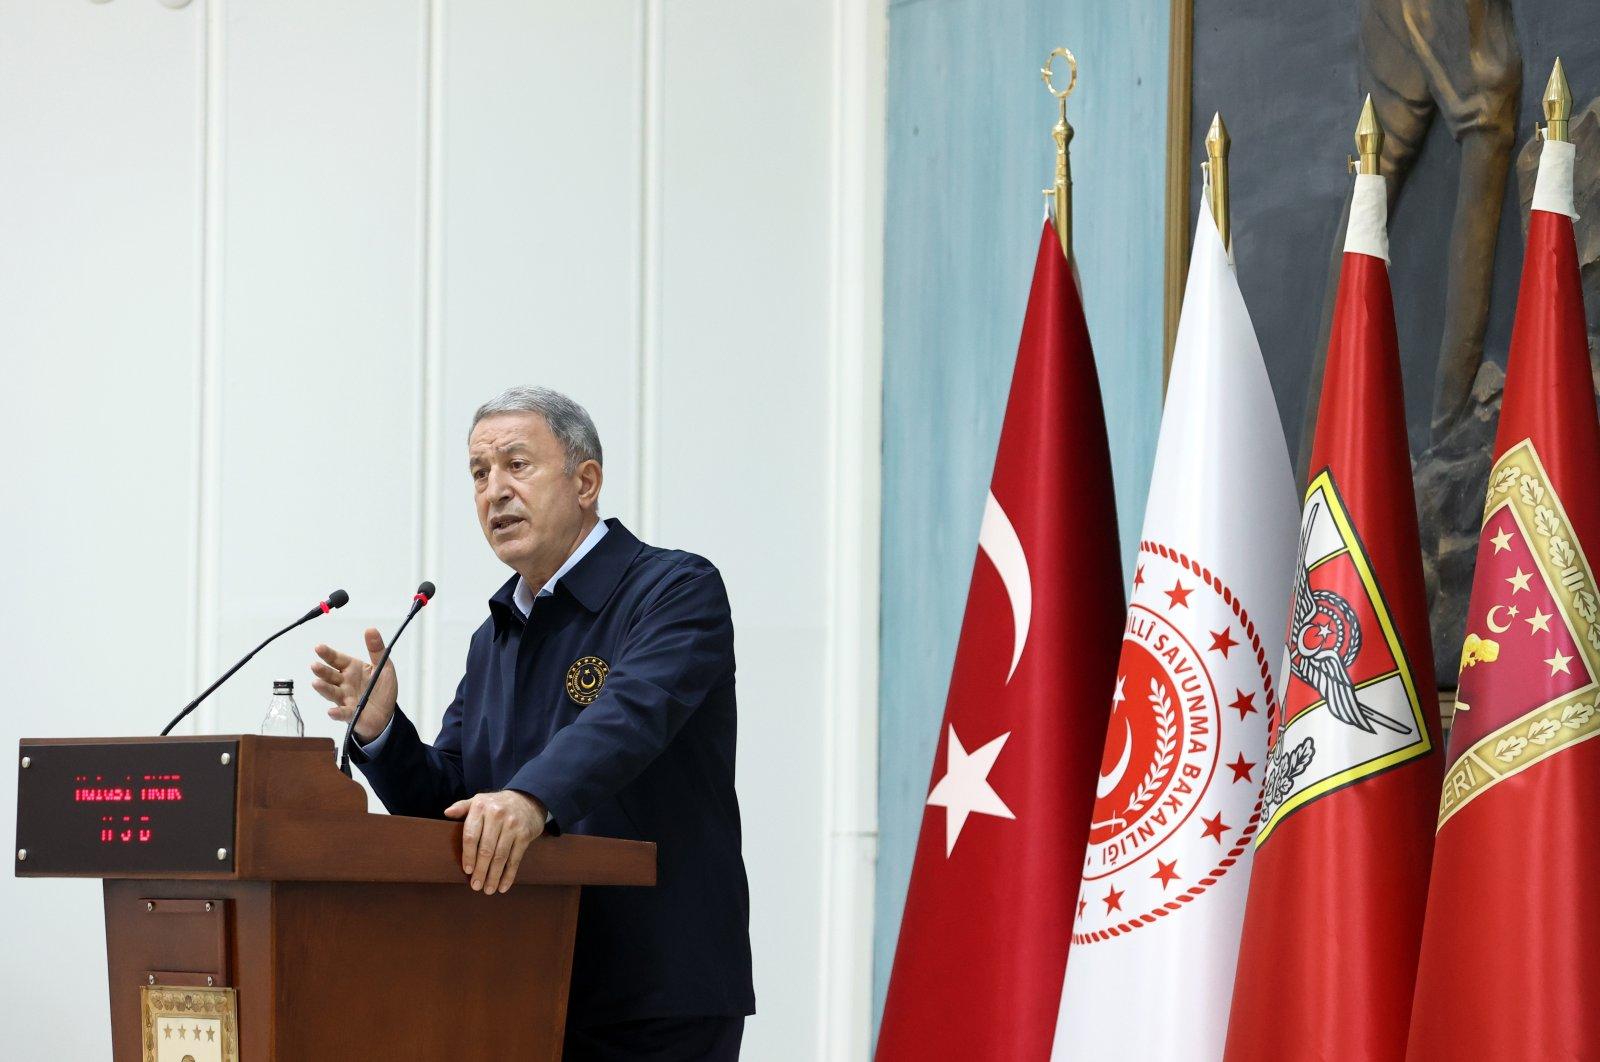 Defense Minister Hulusi Akar addresses military personnel in Malatya, eastern Turkey, June 25, 2021. (AA Photo)